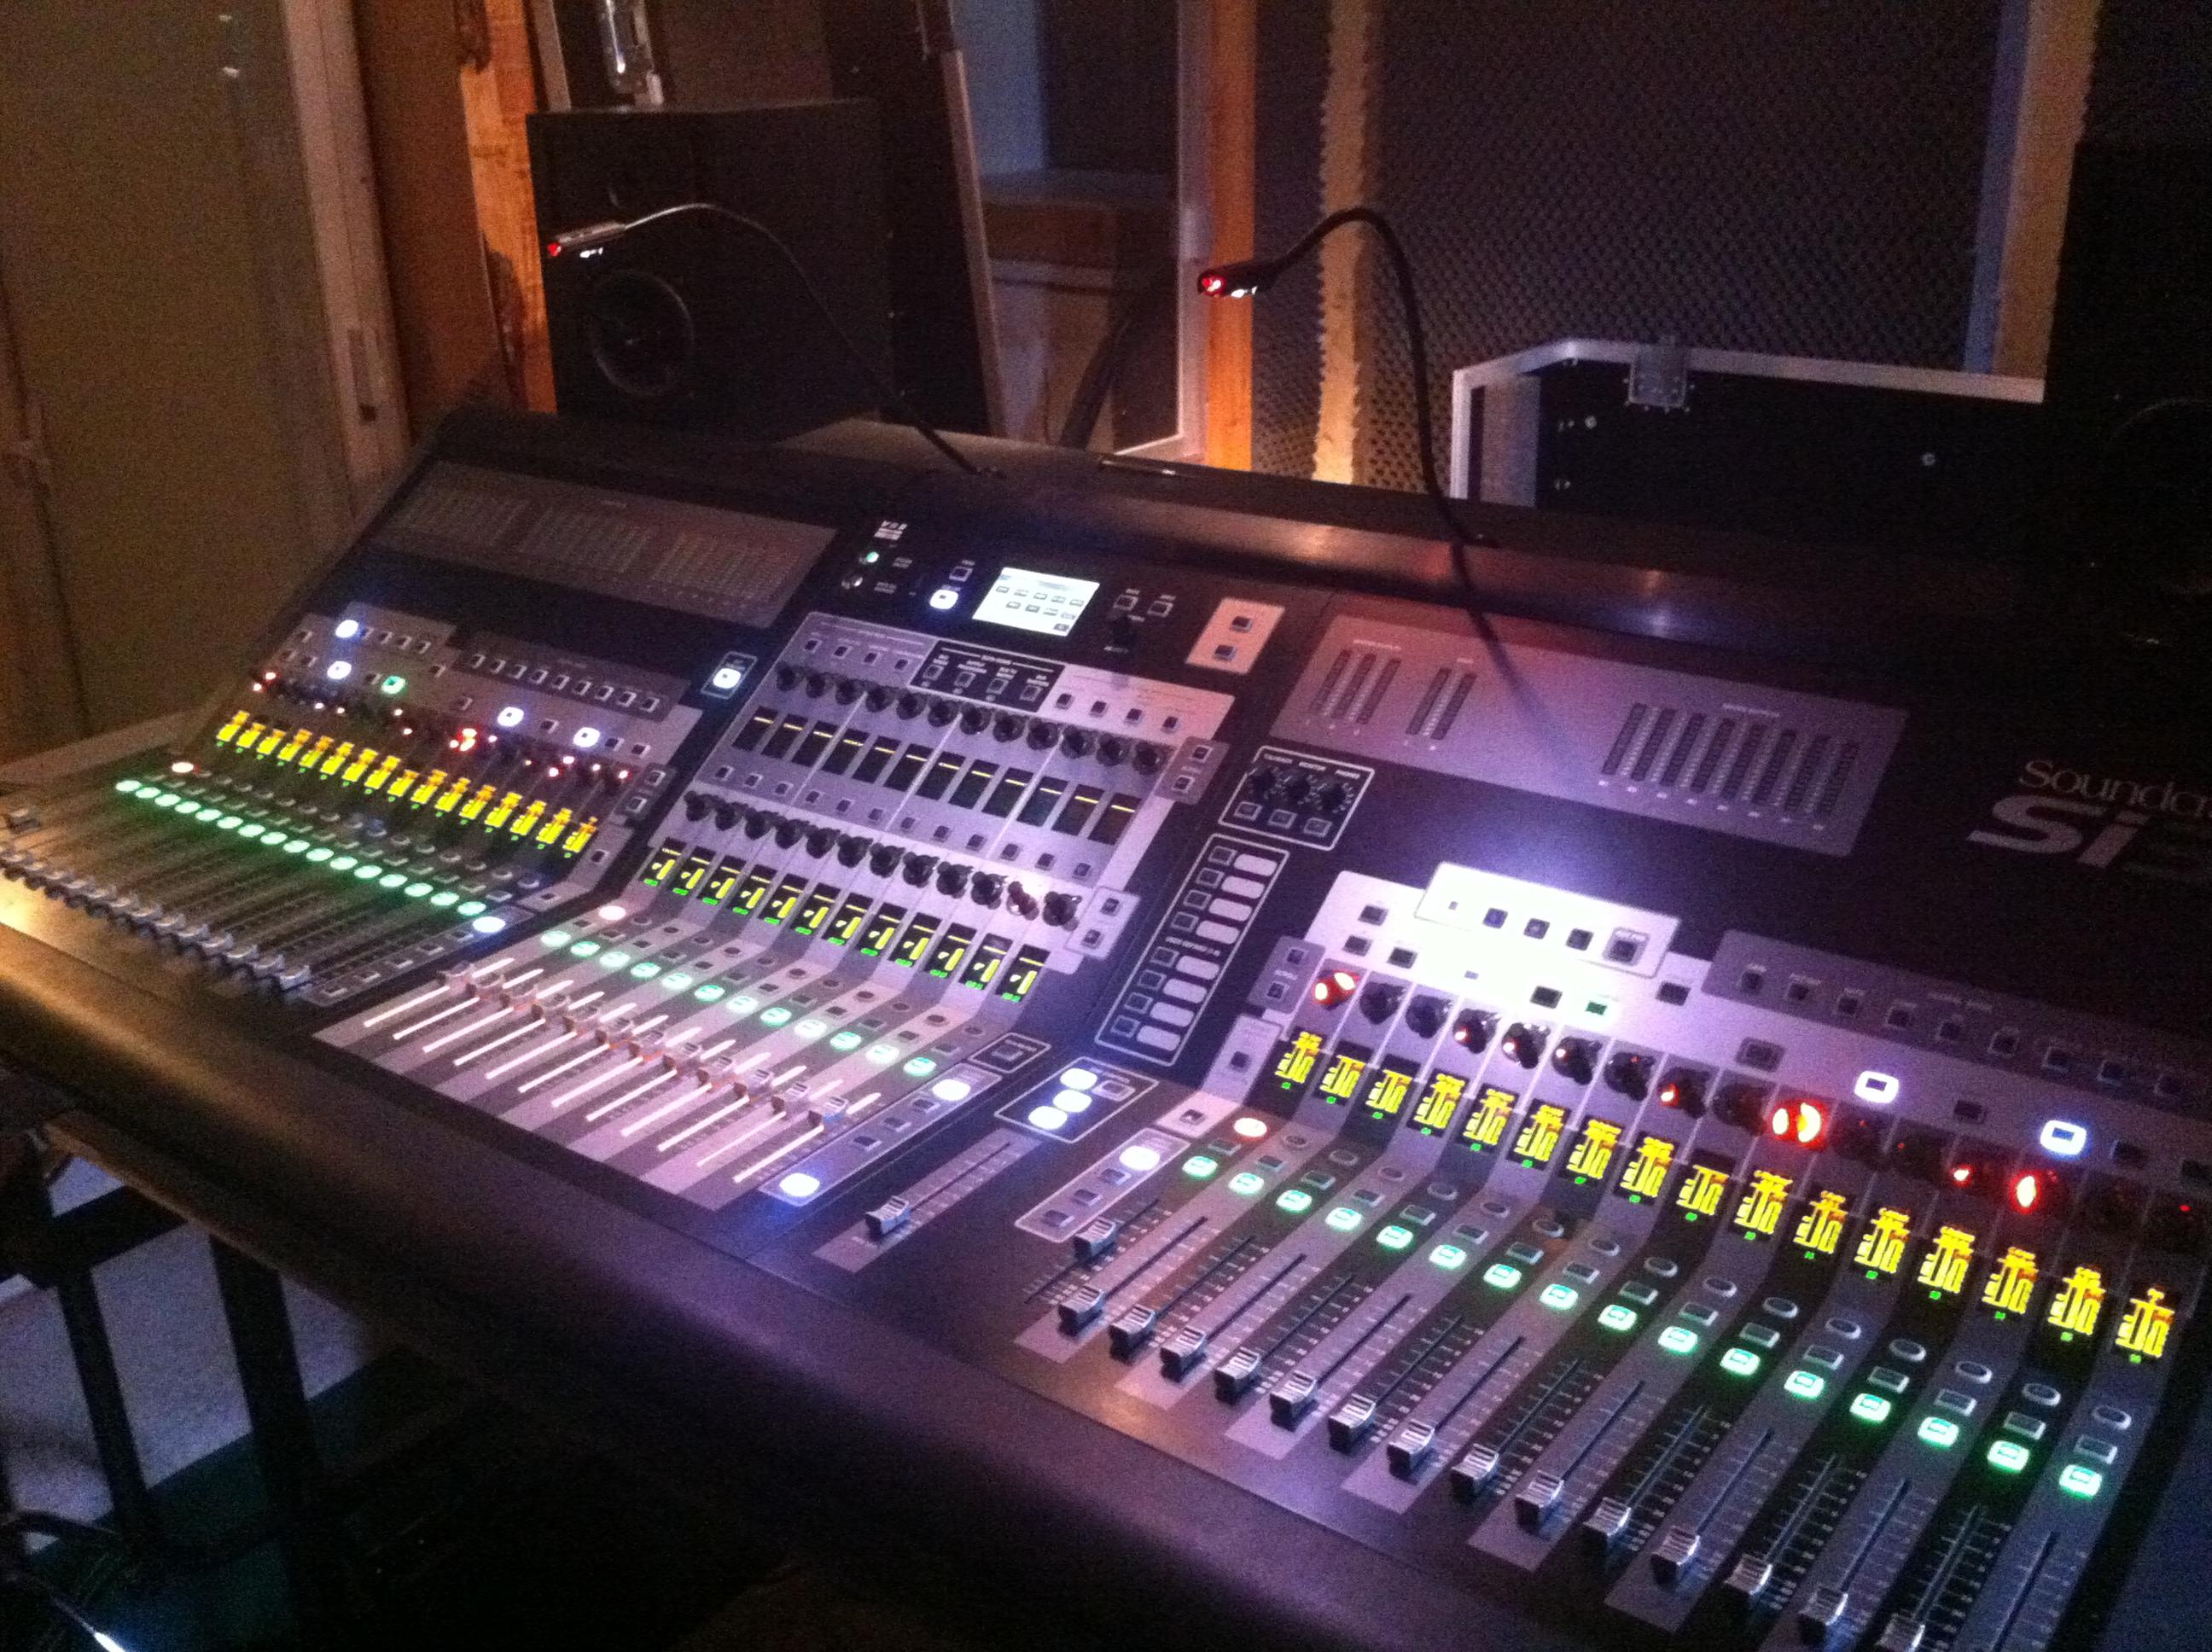 Soundcraft Si3 image (#548849) - Audiofanzine